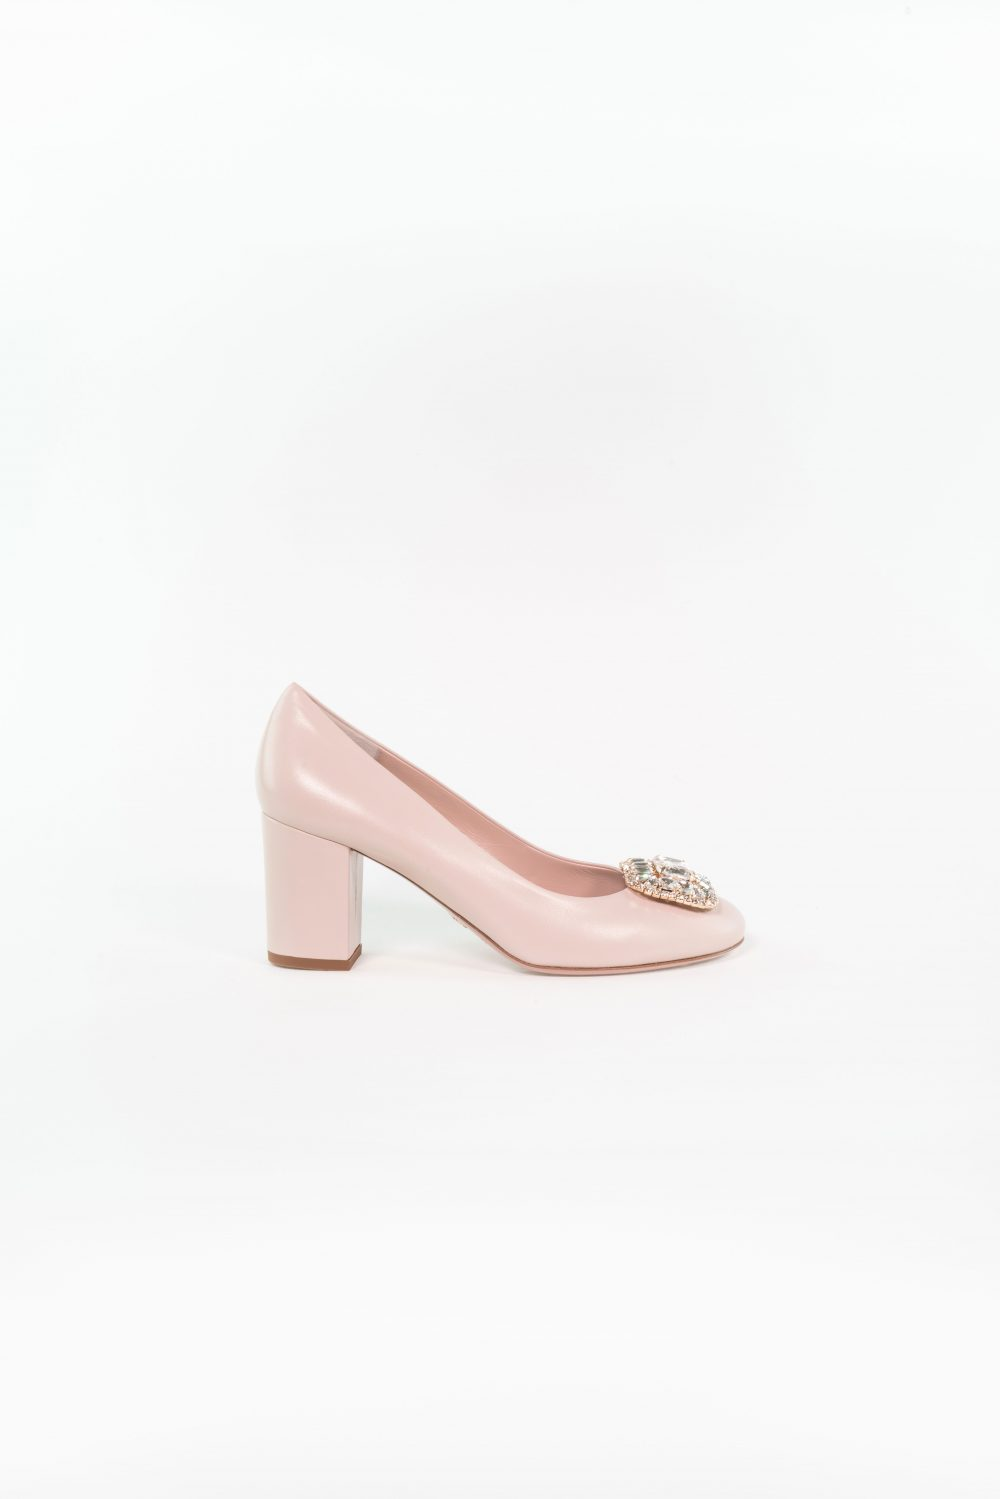 Brautschuh Jette in nude rose